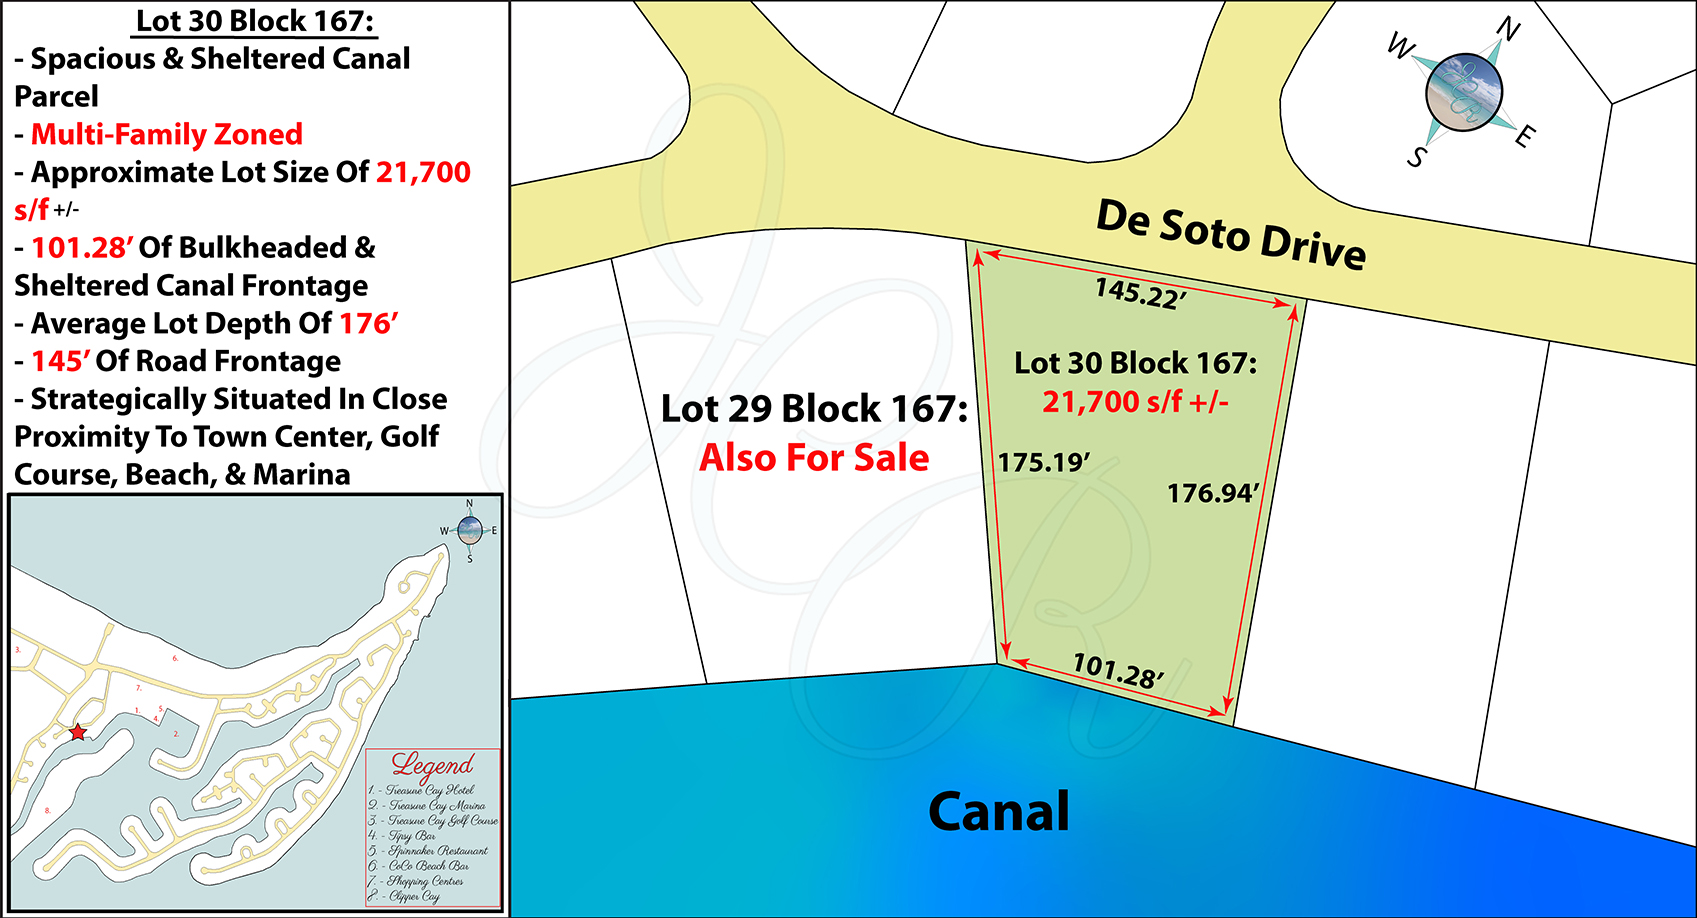 Lot 30 Block 167 Plot Plan John Cash Realty